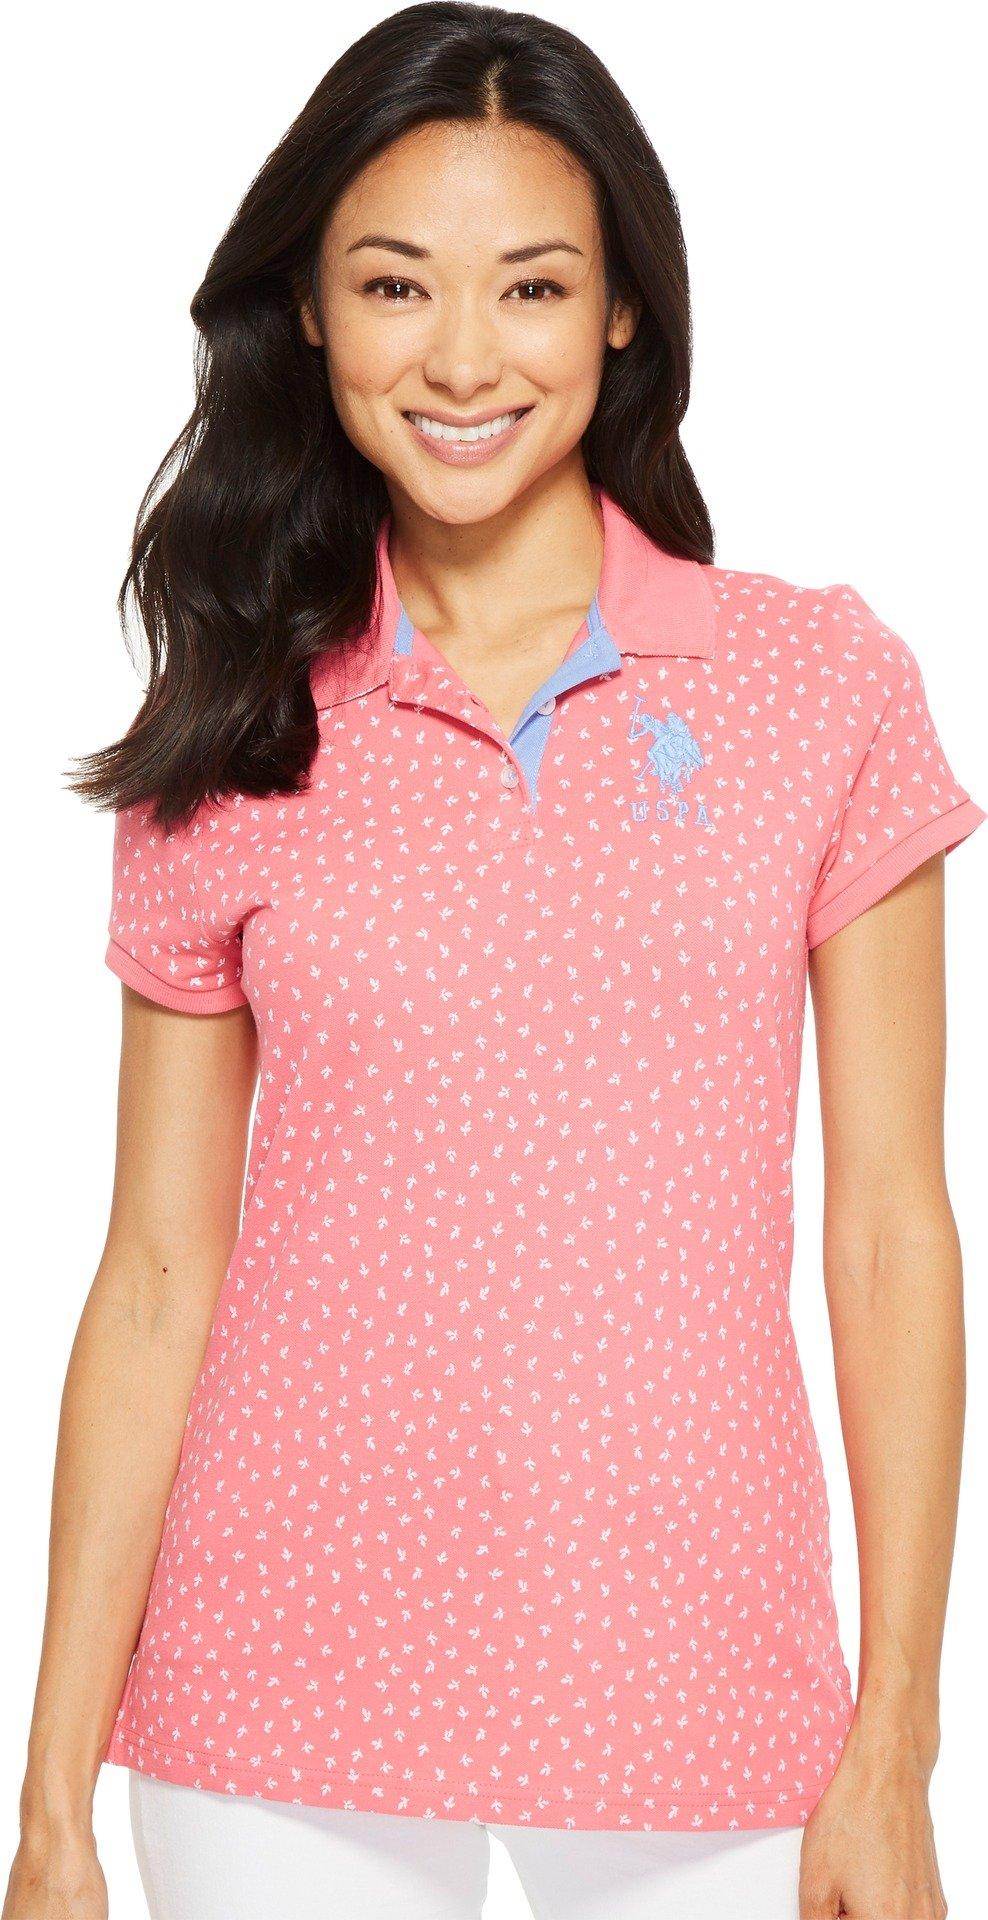 U.S. Polo Assn. Women's Short Sleeve Fashion Polo Shirt, Fierce Pink, M